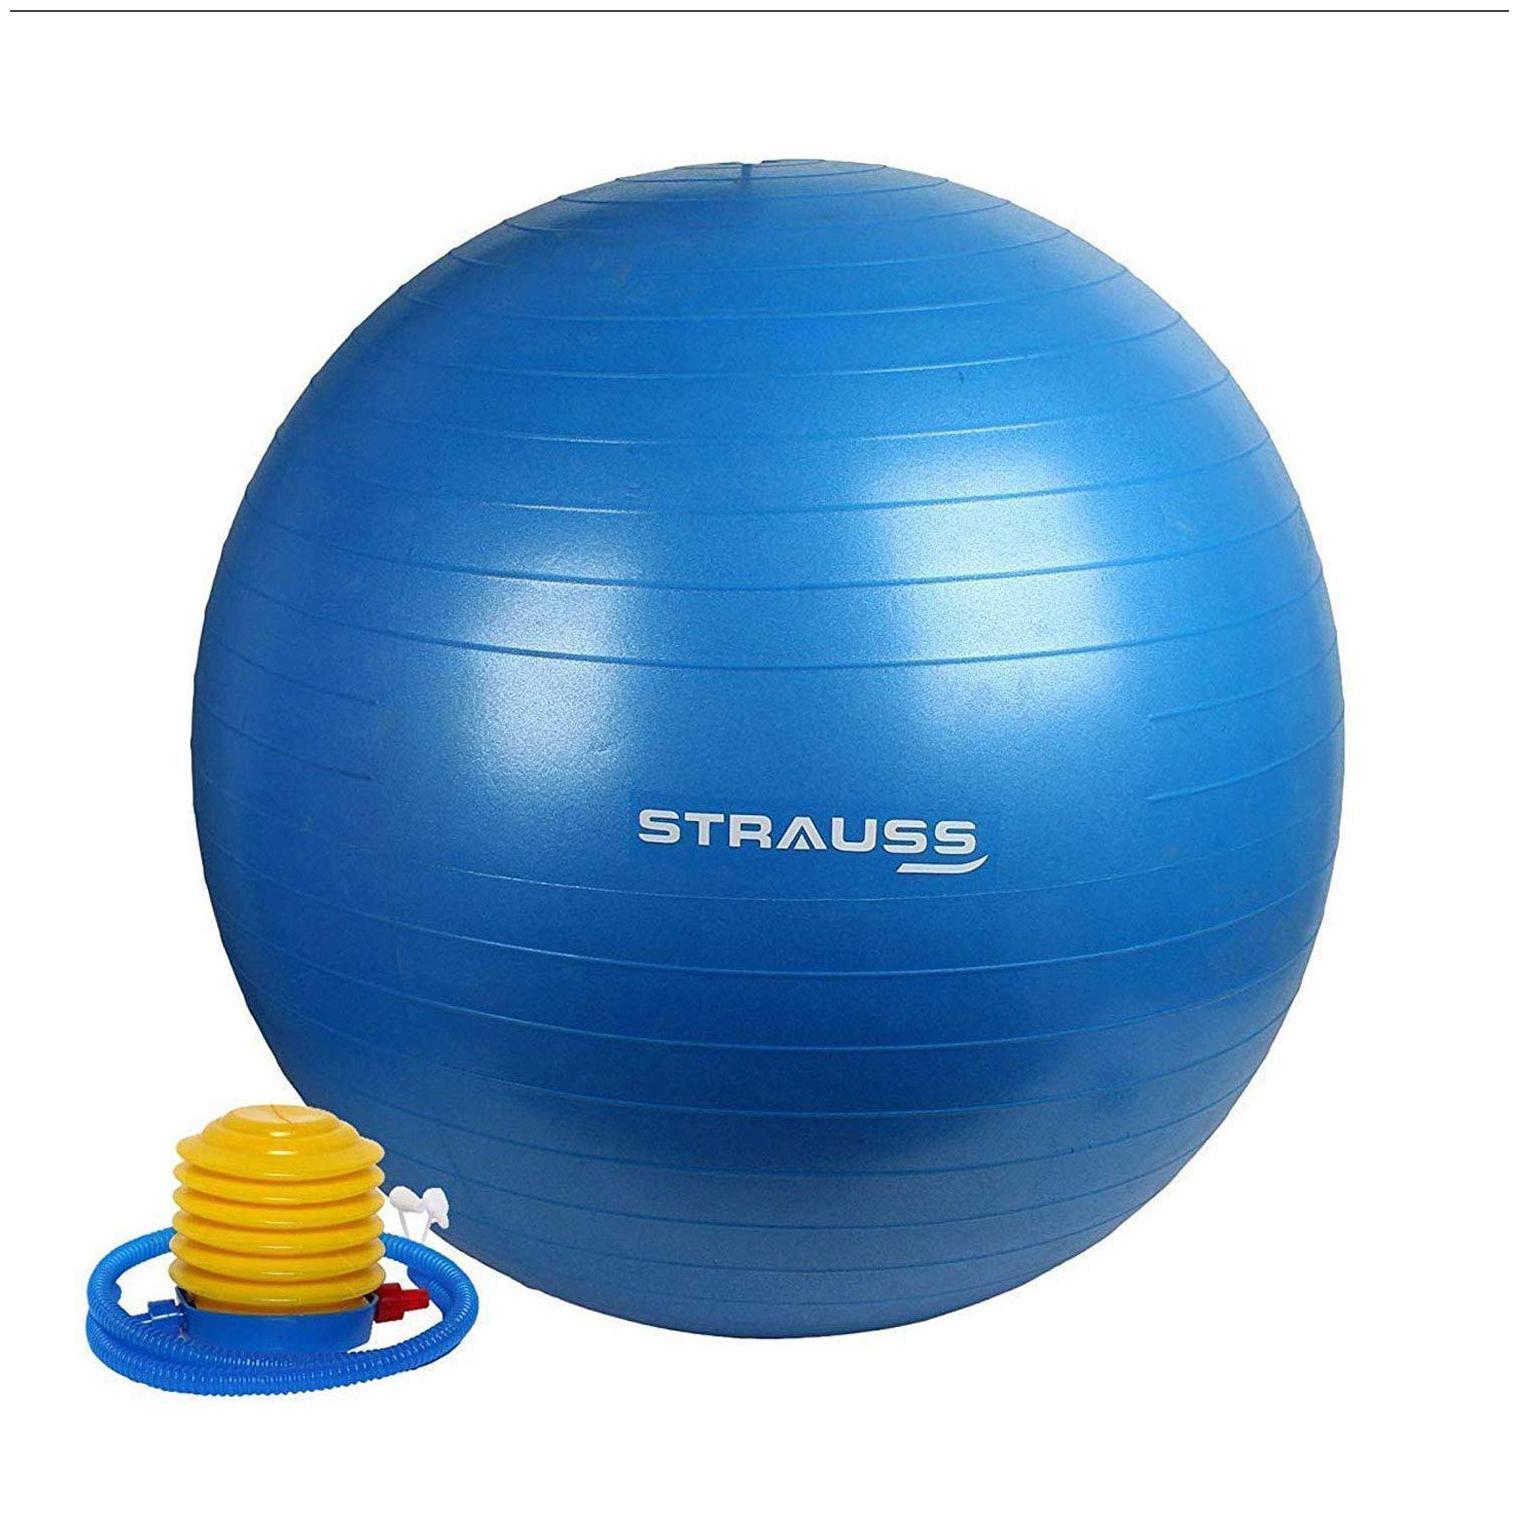 Strauss Anti Burst Gym Ball with Foot Pump, 85 CM  Blue  by Khel Kood